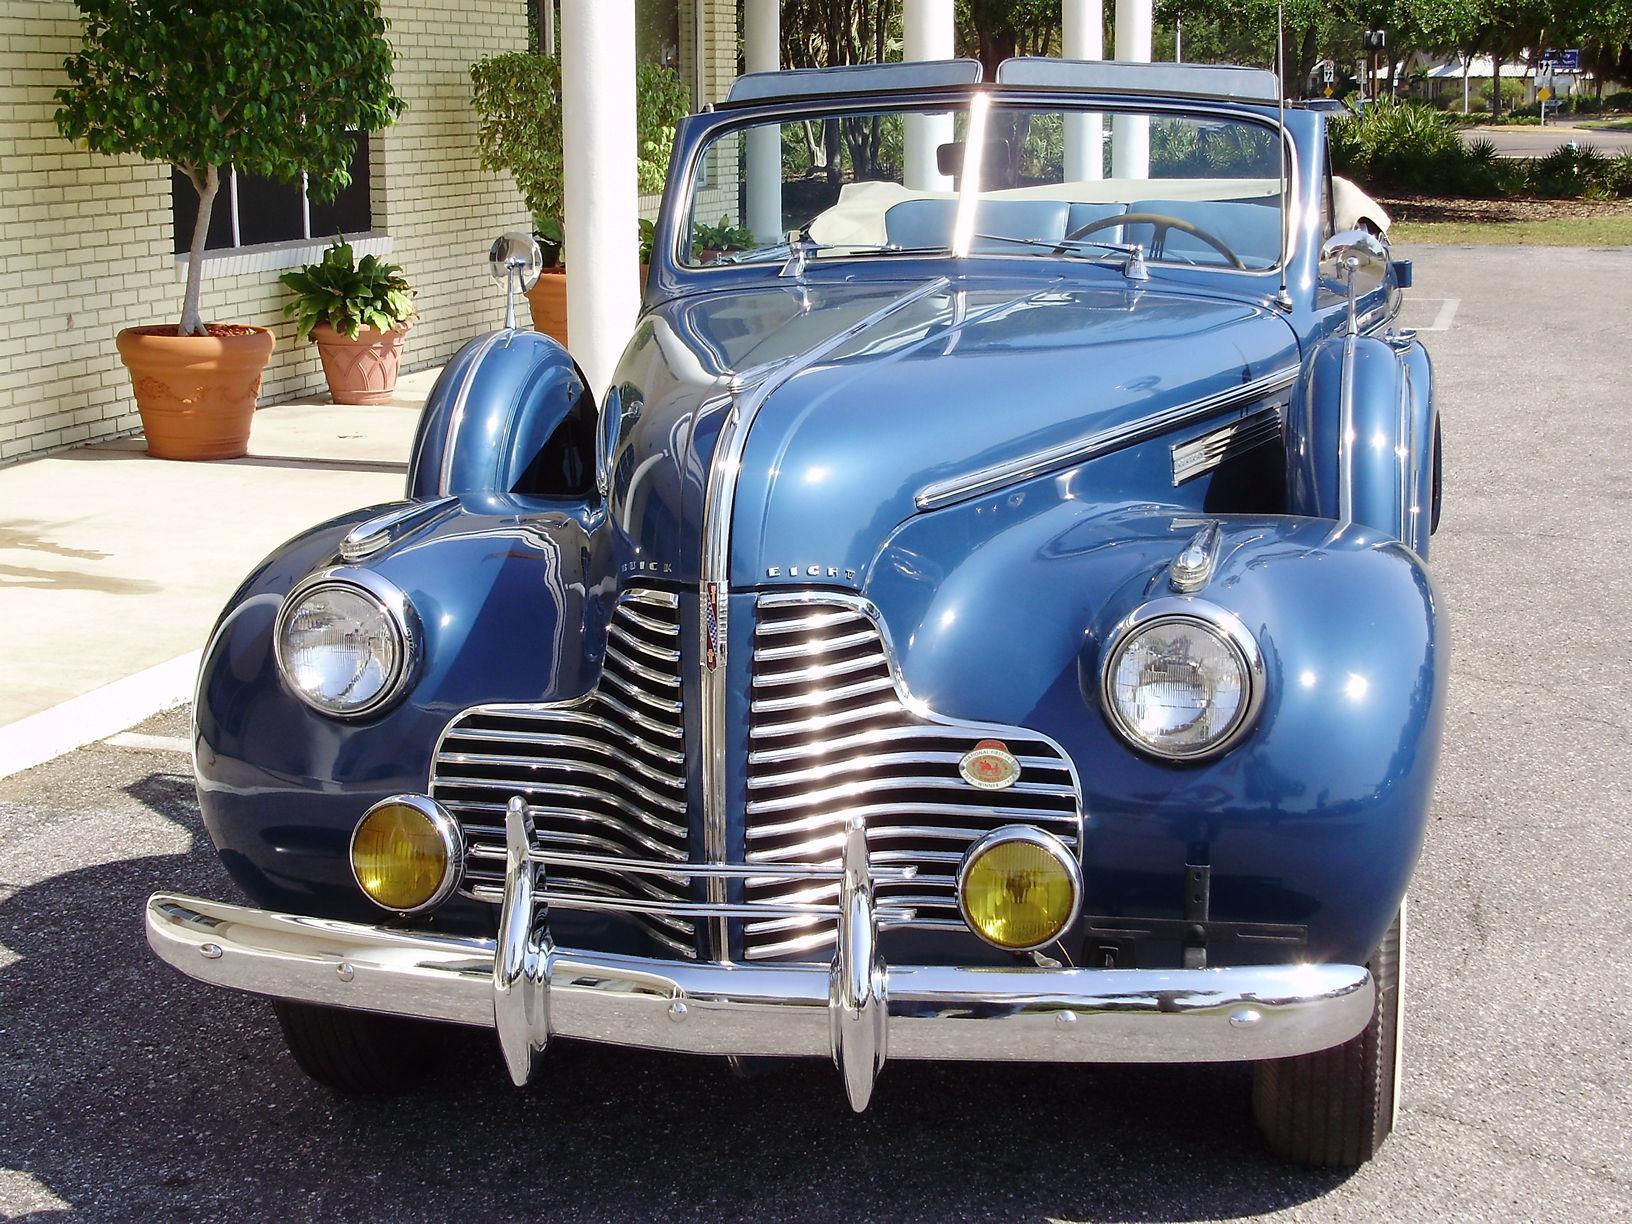 1940 BUICK CENTURY CONVERTIBLE SEDAN - Vintage Motors of Sarasota Inc. #11